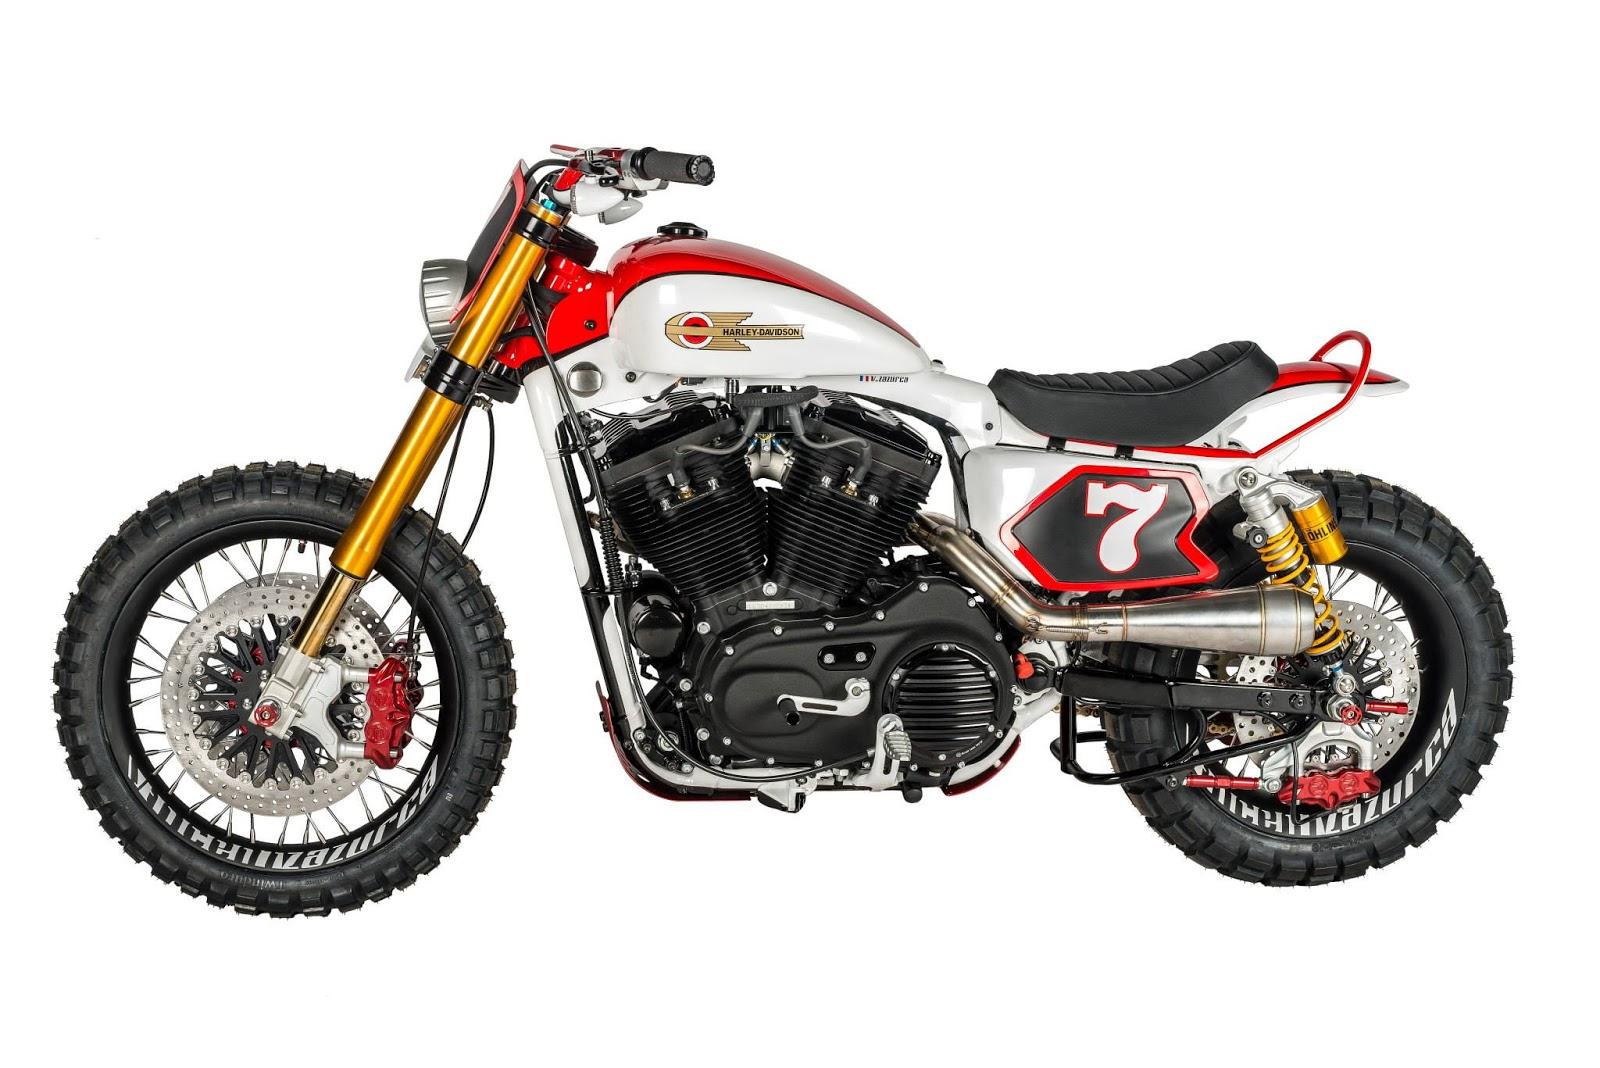 Motogp Harley Xlzt3 Scrambler By Shaw Speed Custom Motorcycle Wiring Harness